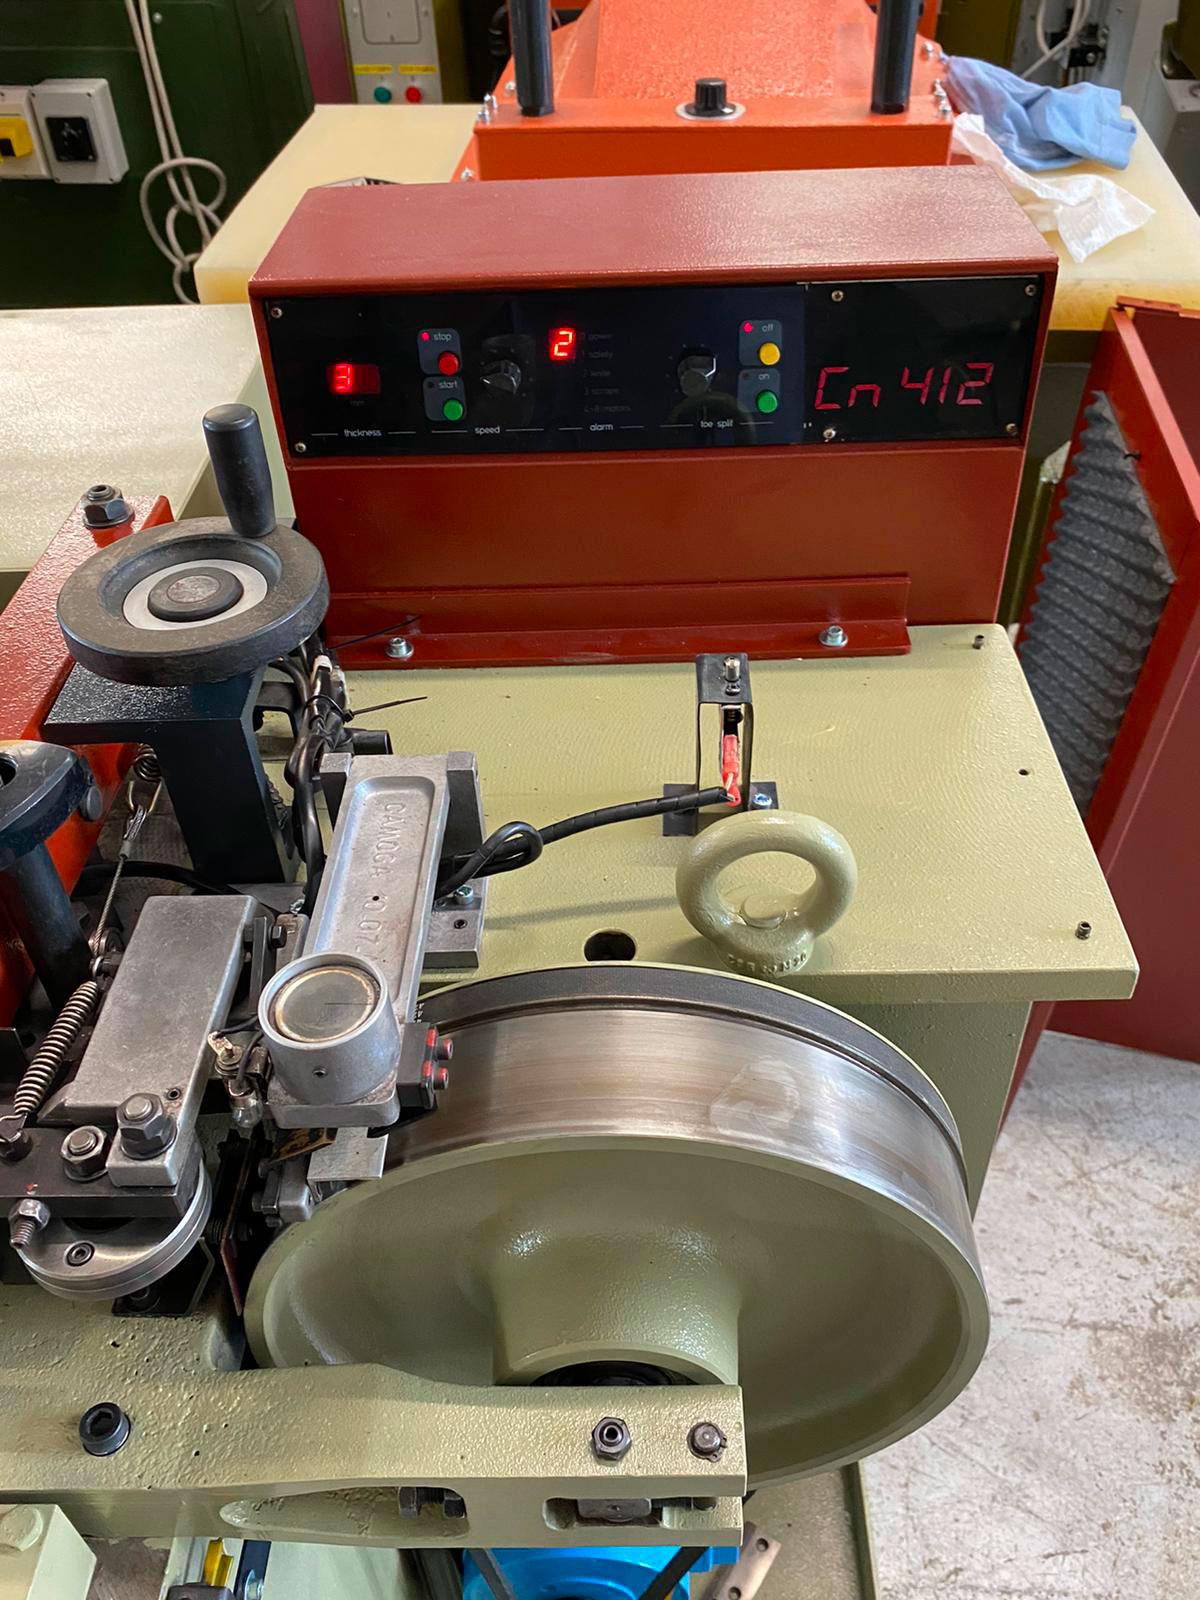 Macchinari per pelletterie e calzaturifici | Vissani Macchine